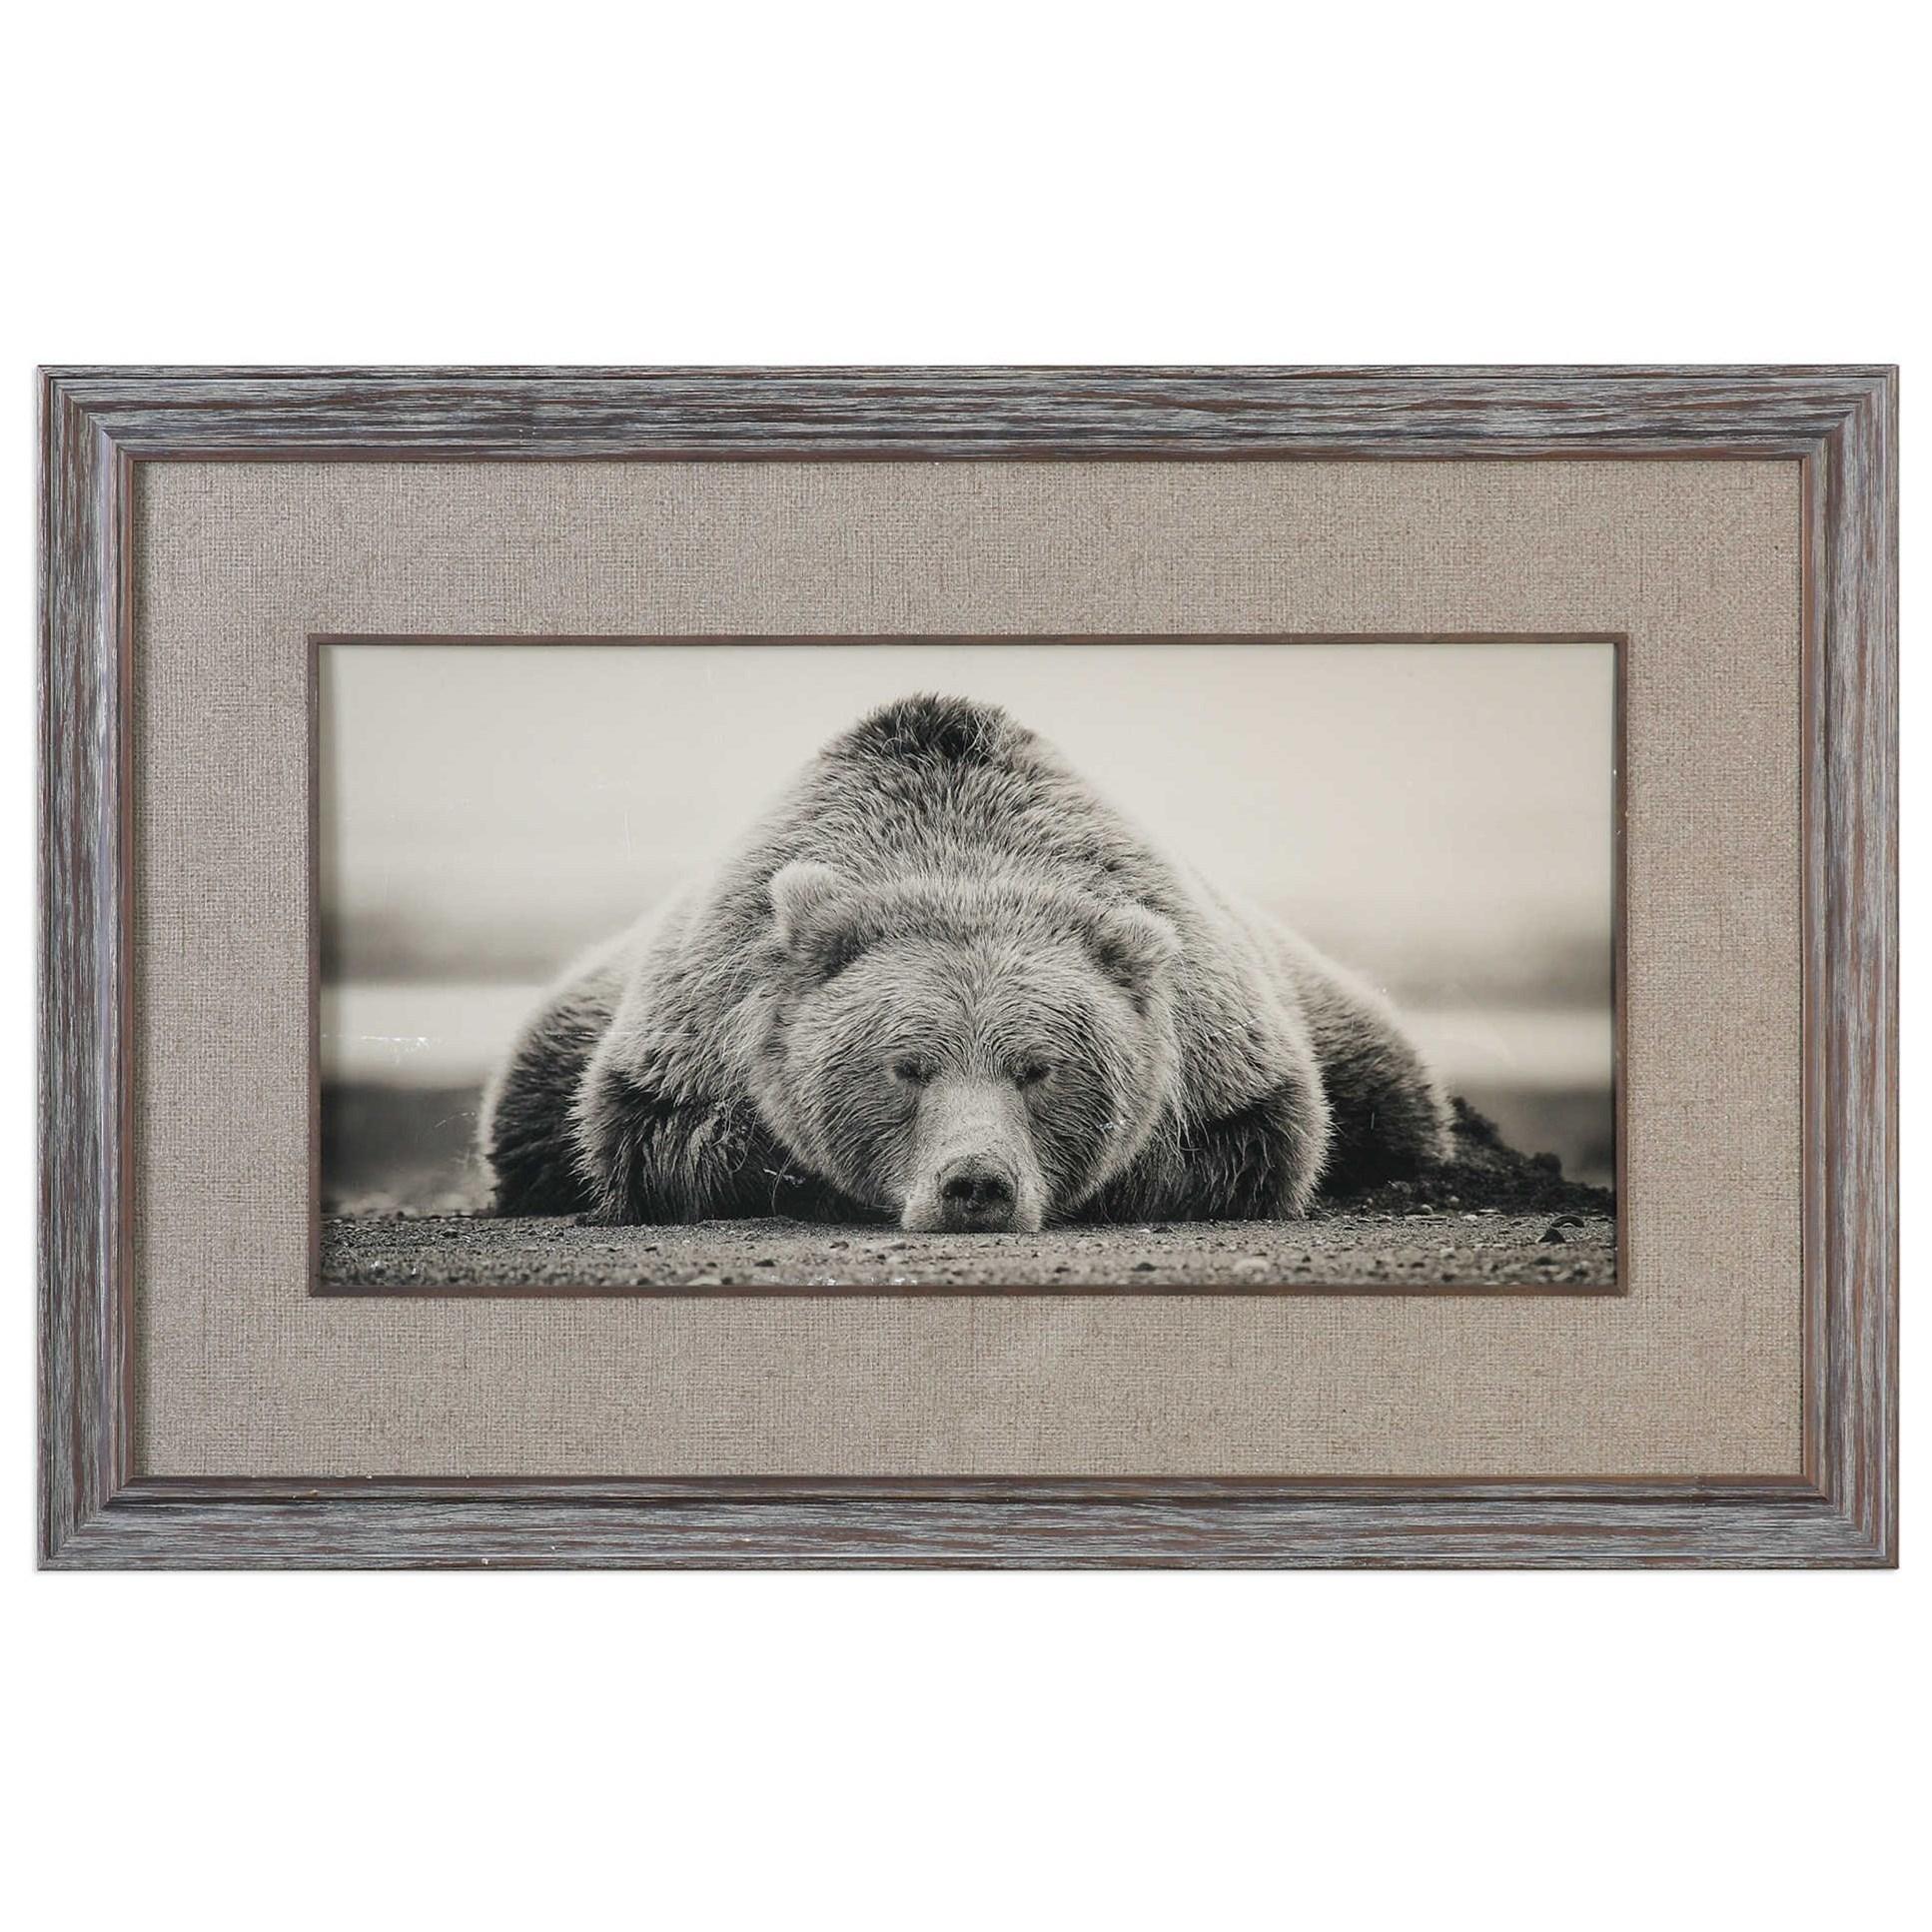 Framed Prints Deep Sleep Bear Print by Unique at Walker's Furniture